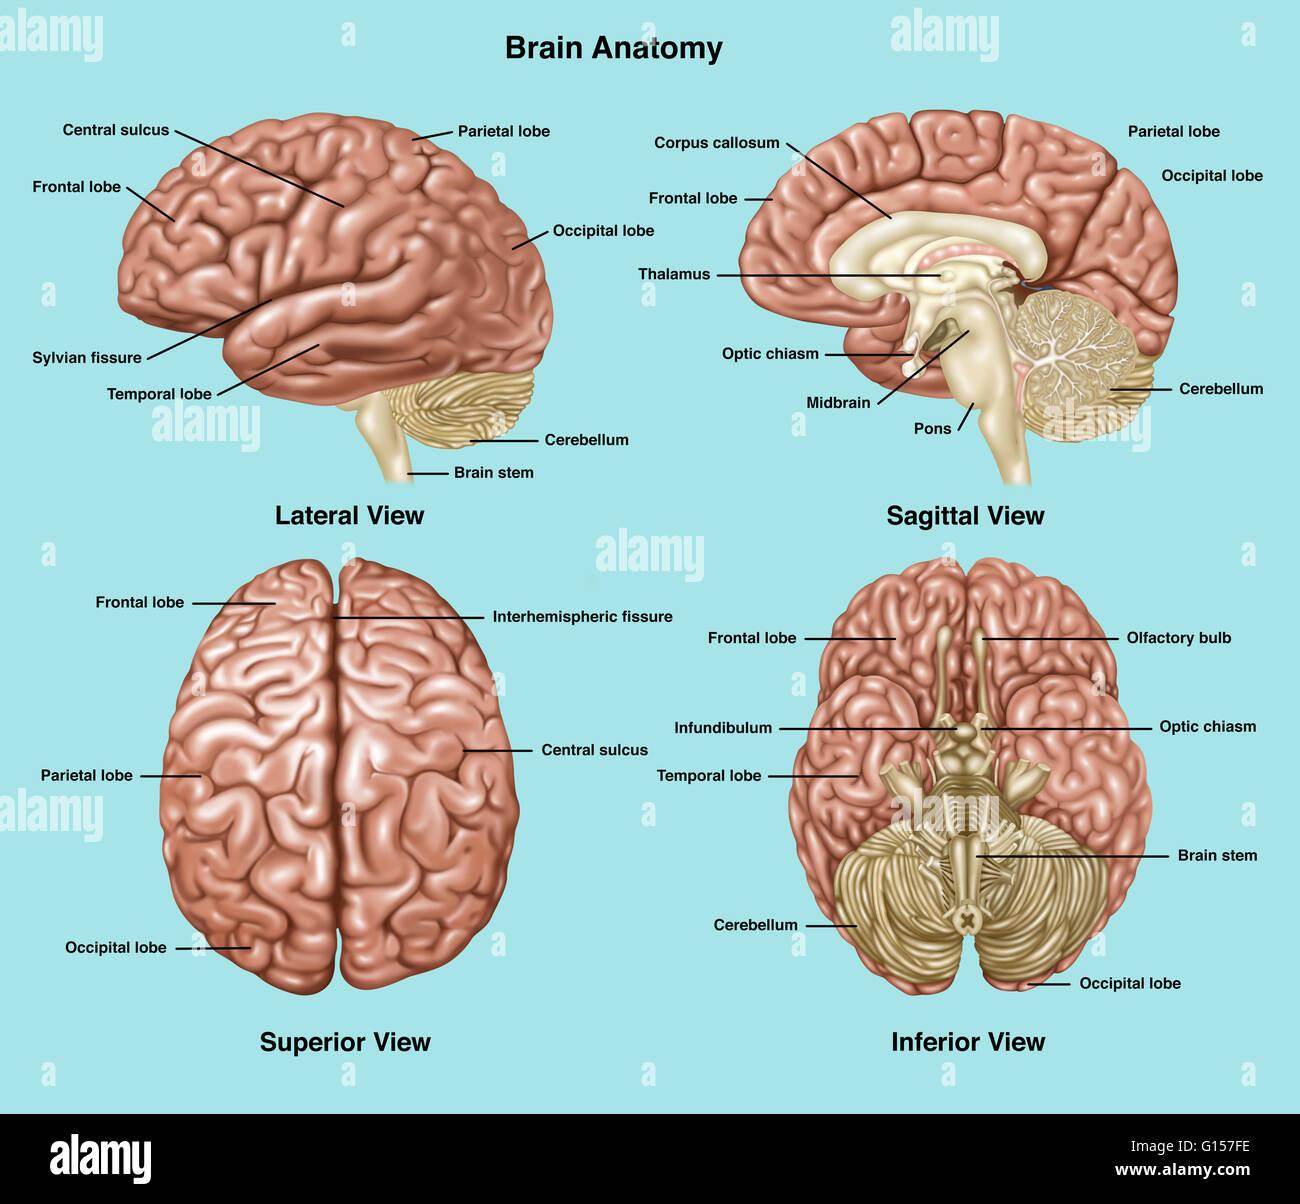 Sagittal brain anatomy